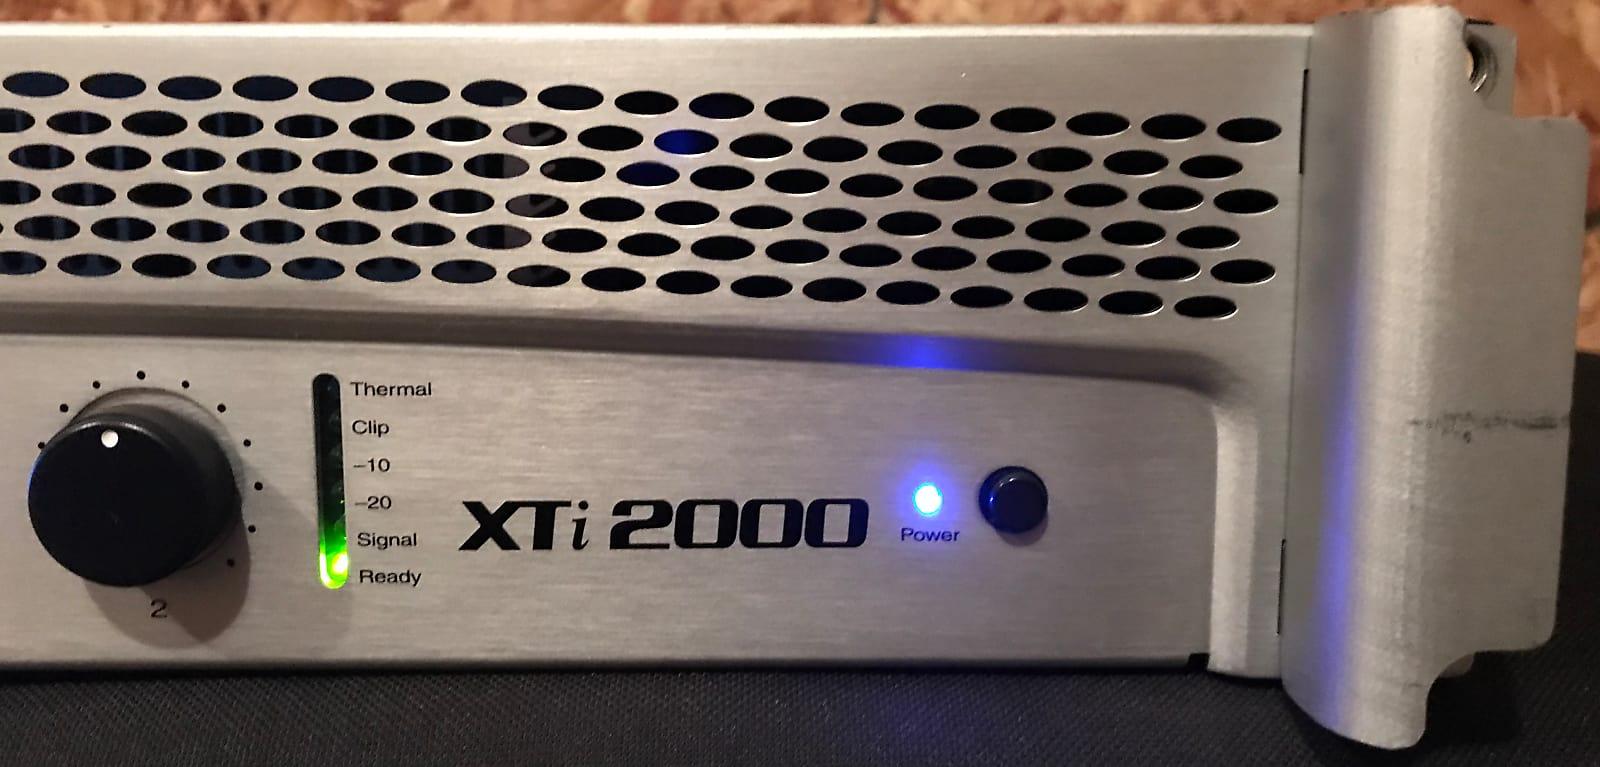 Crown Xti 2000 2 Channel Power Amplifier Watts Used Excellent Watt Condition